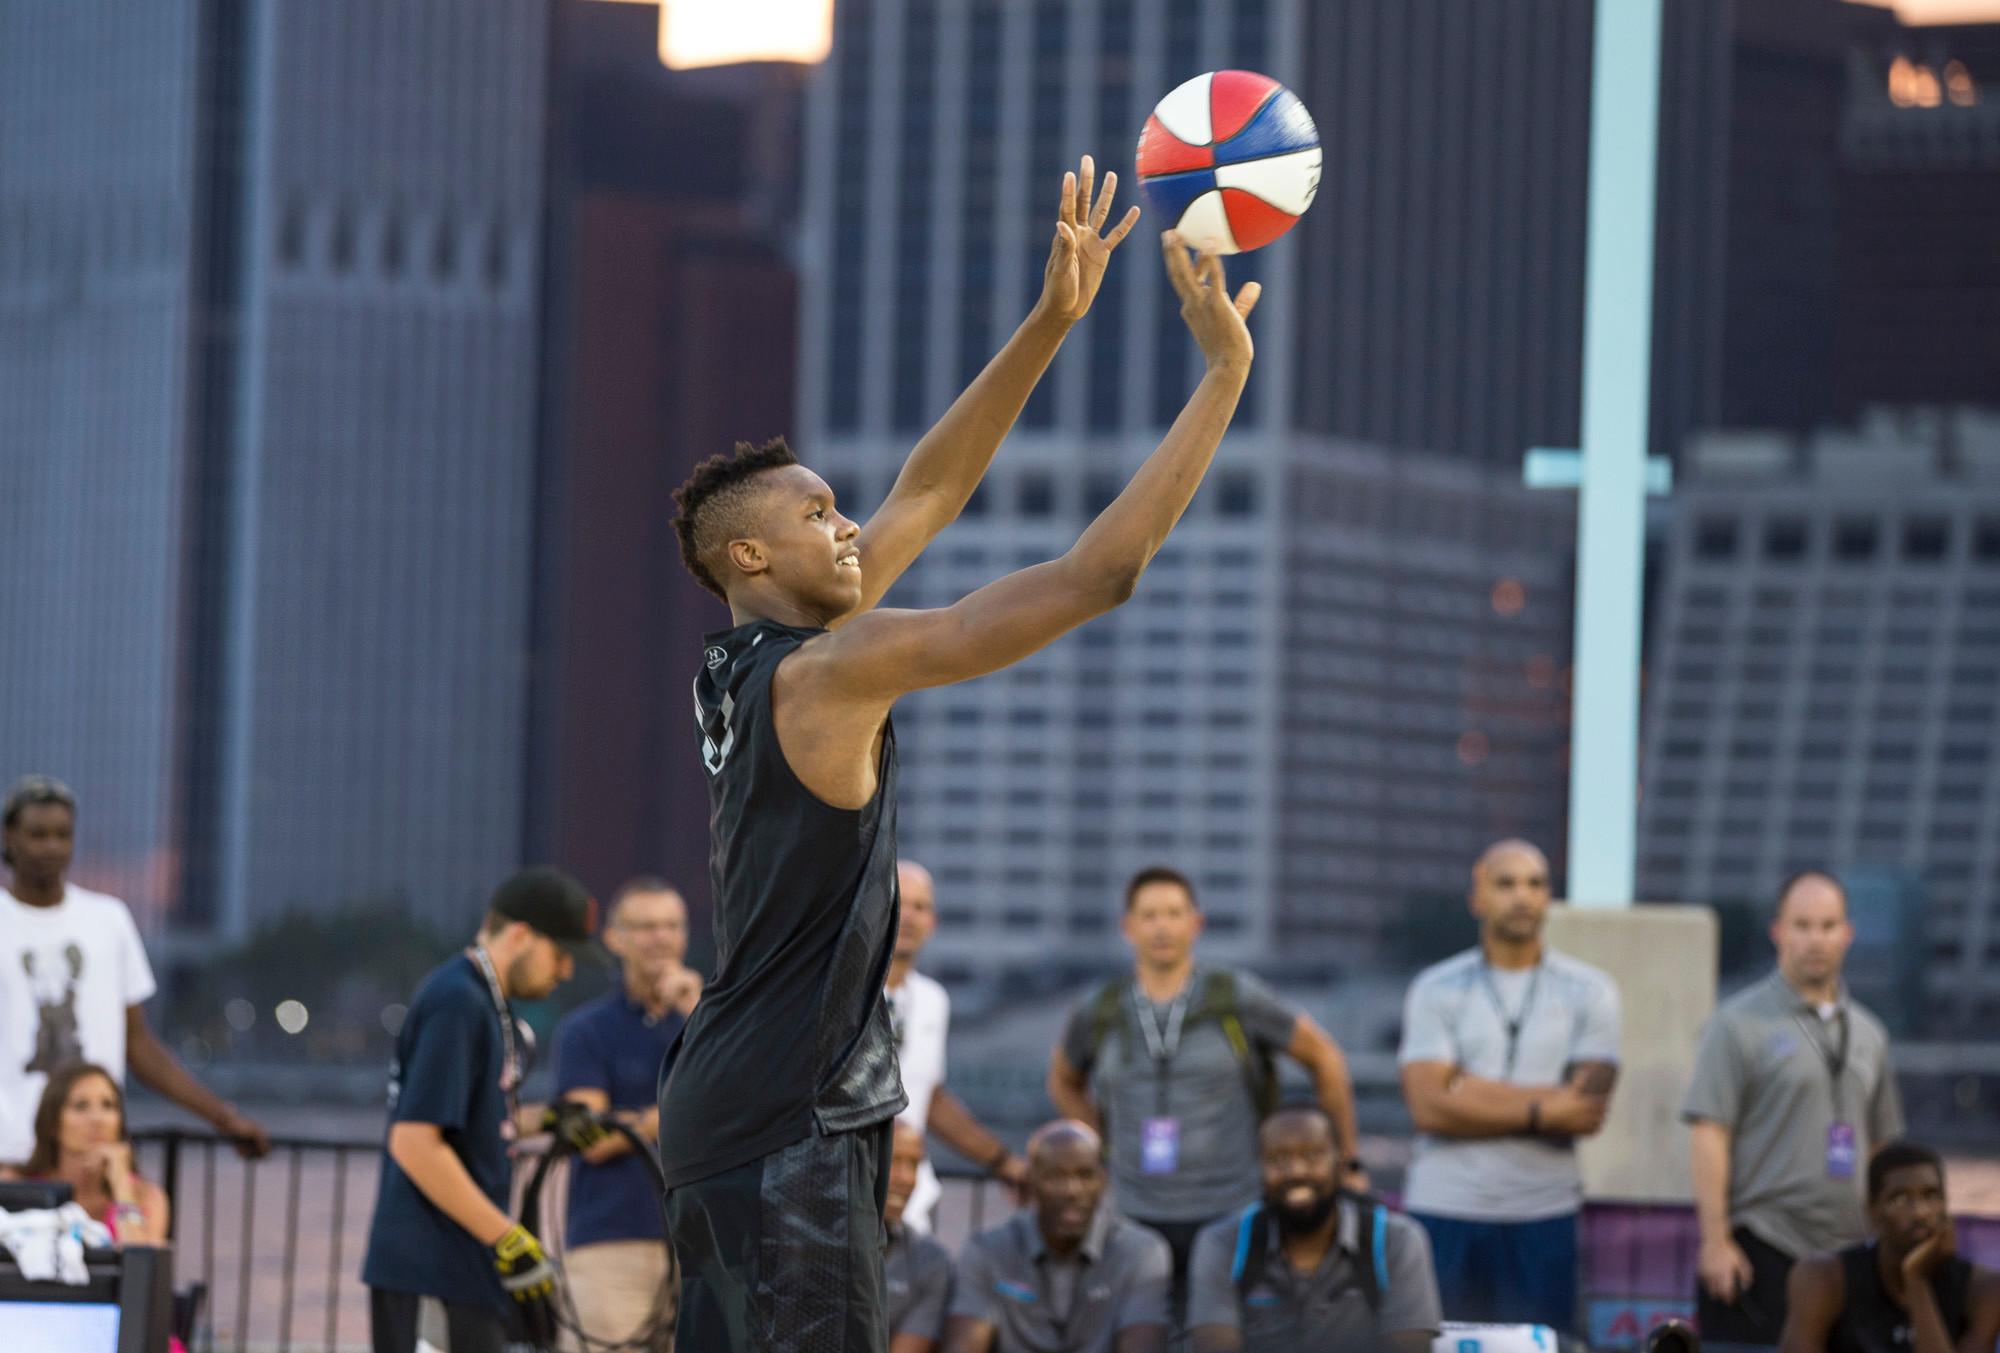 2013 Recruits Uk Basketball And Football Recruiting News: 2018 Wing Louis King Talks Kentucky, Recruiting